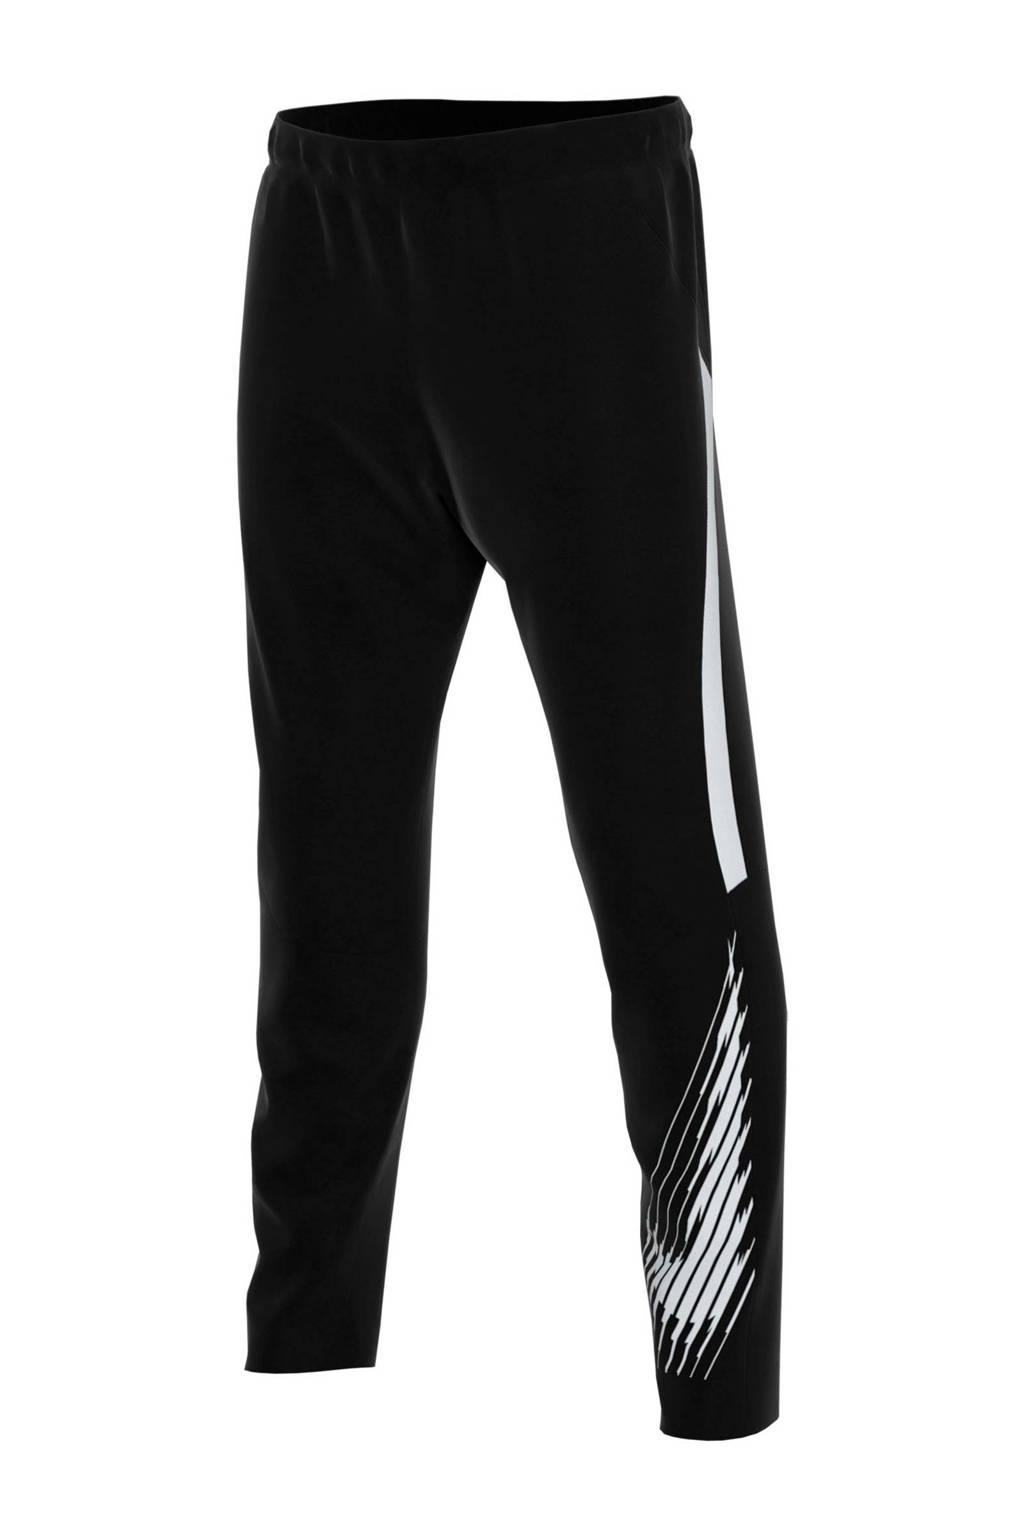 Nike   trainingsbroek zwart, Zwart